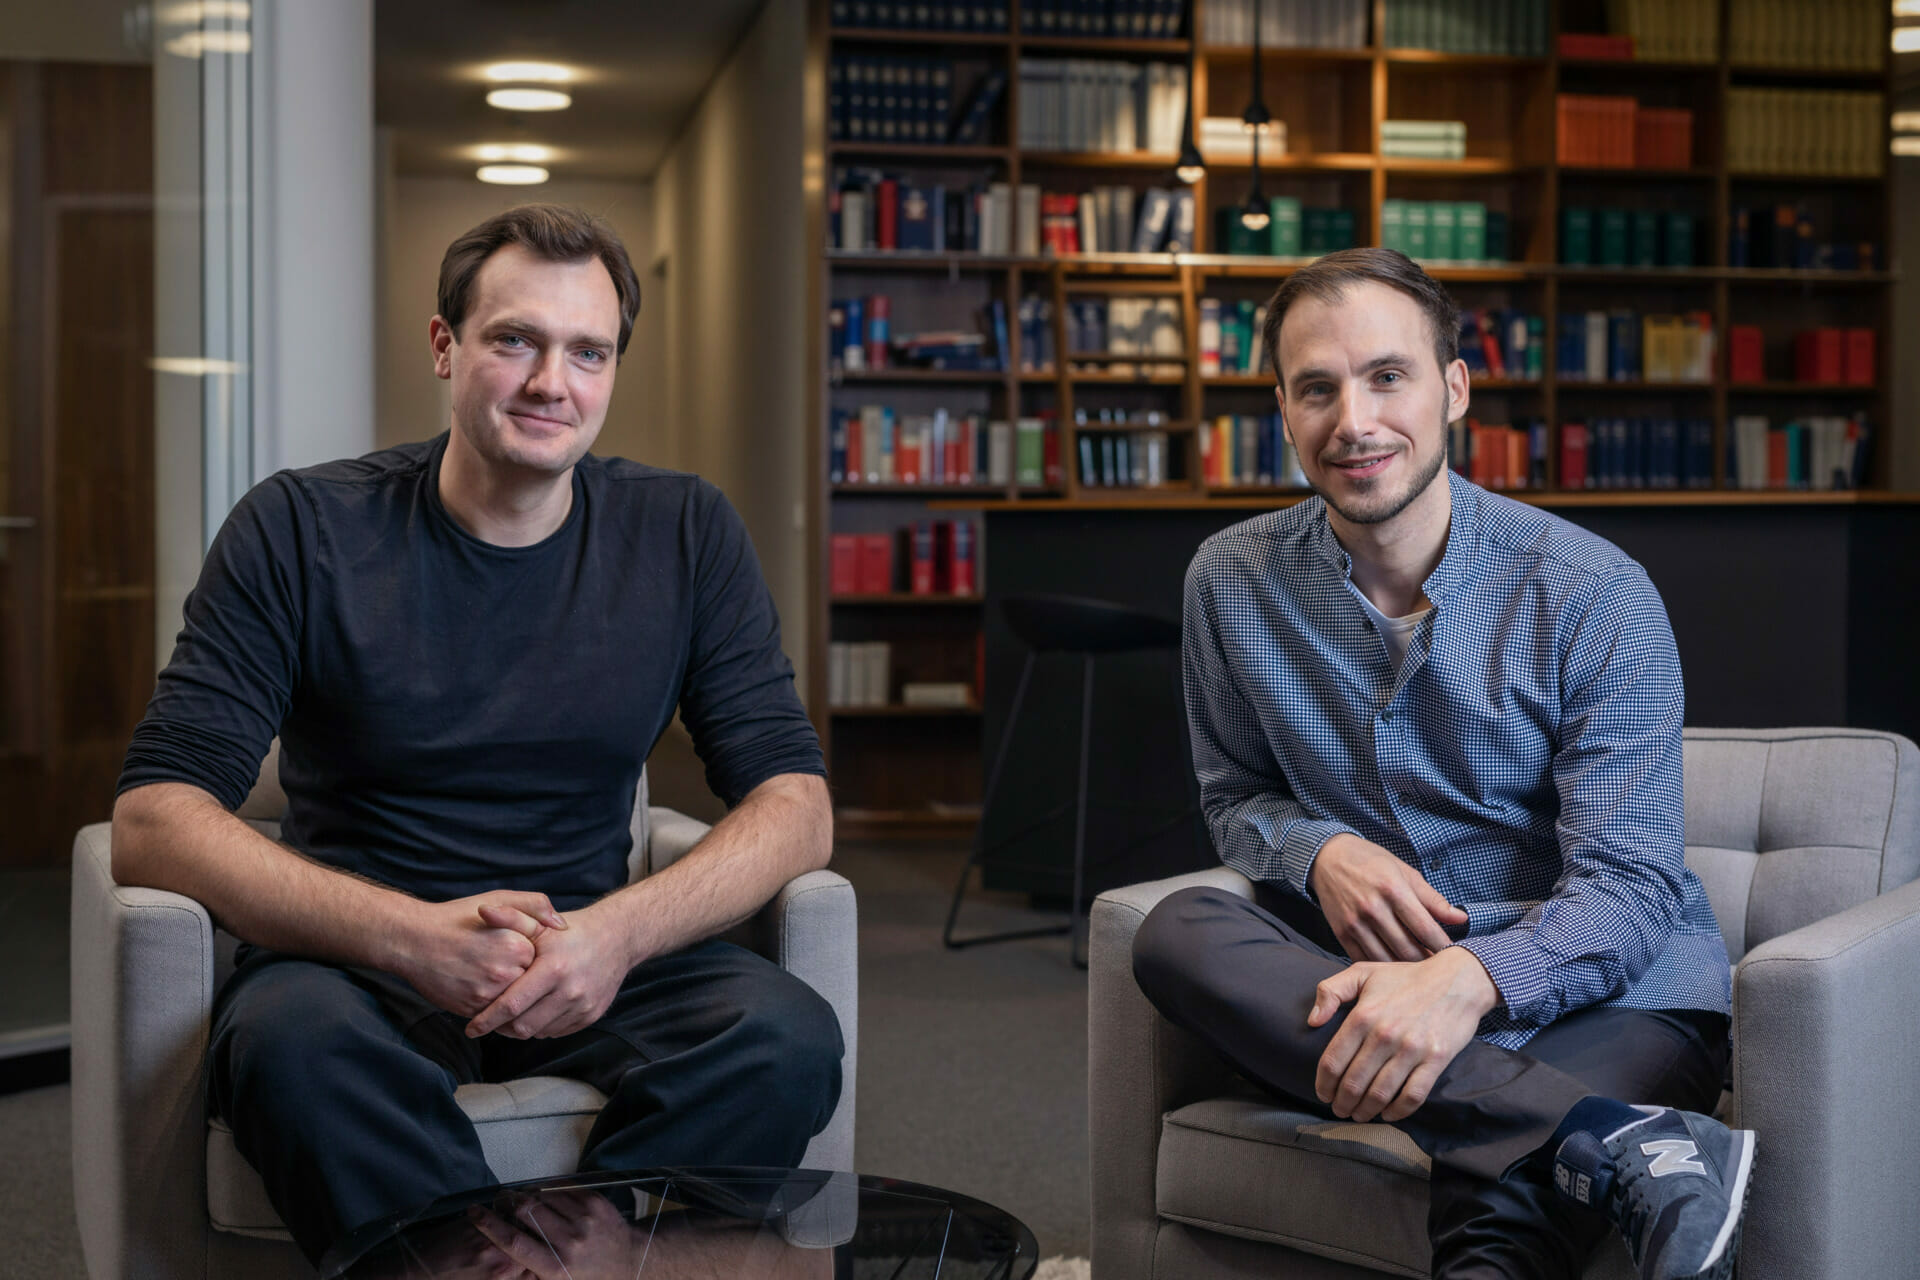 Alexander Graf and Boris Lokschin